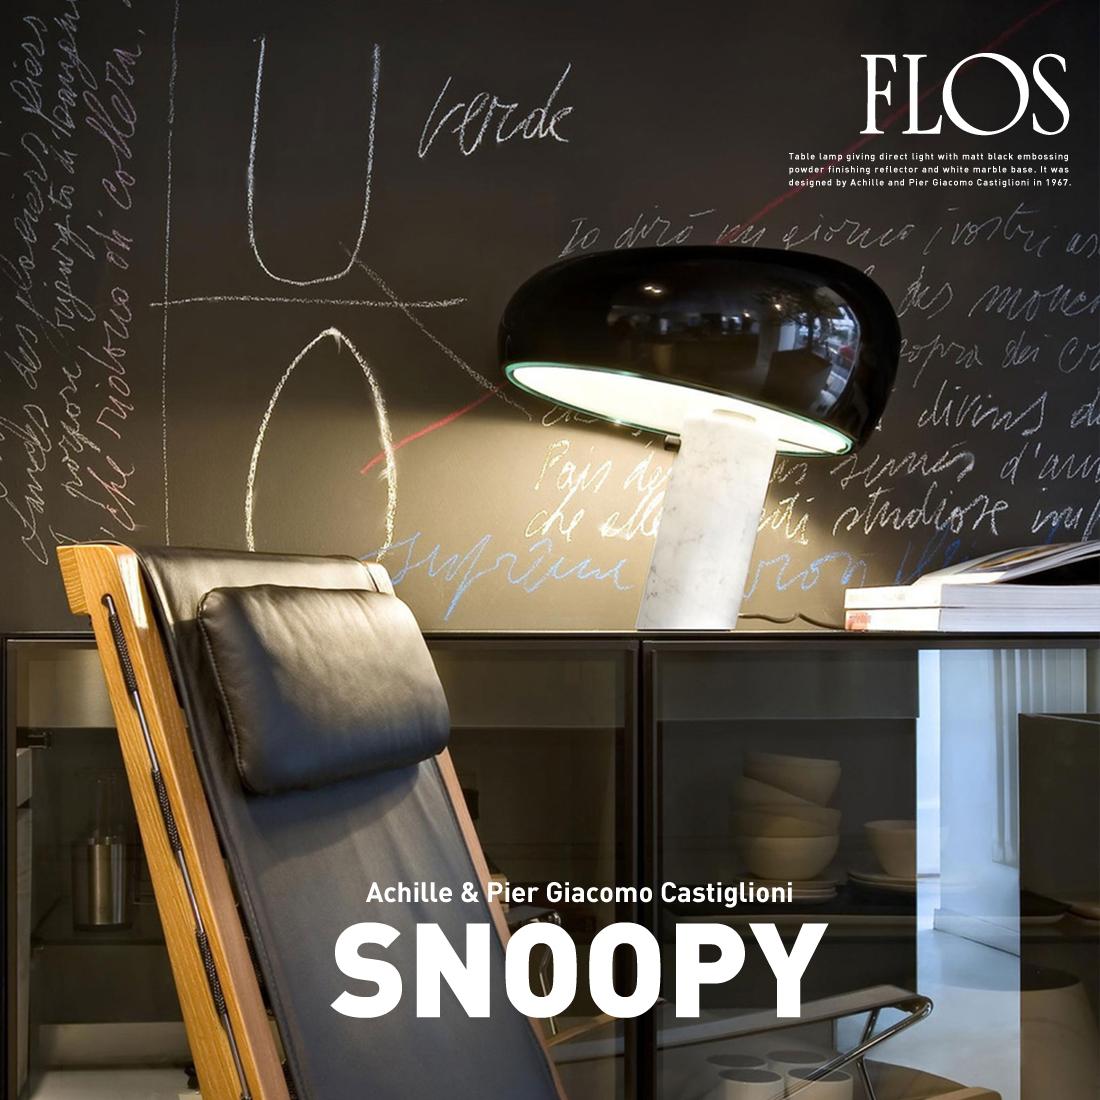 【FLOS フロス】 Snoopy Lamp スヌーピーランプ テーブルランプ ライト 照明 デザイナーズ スタンド ペンダント テーブル 【代引き不可】